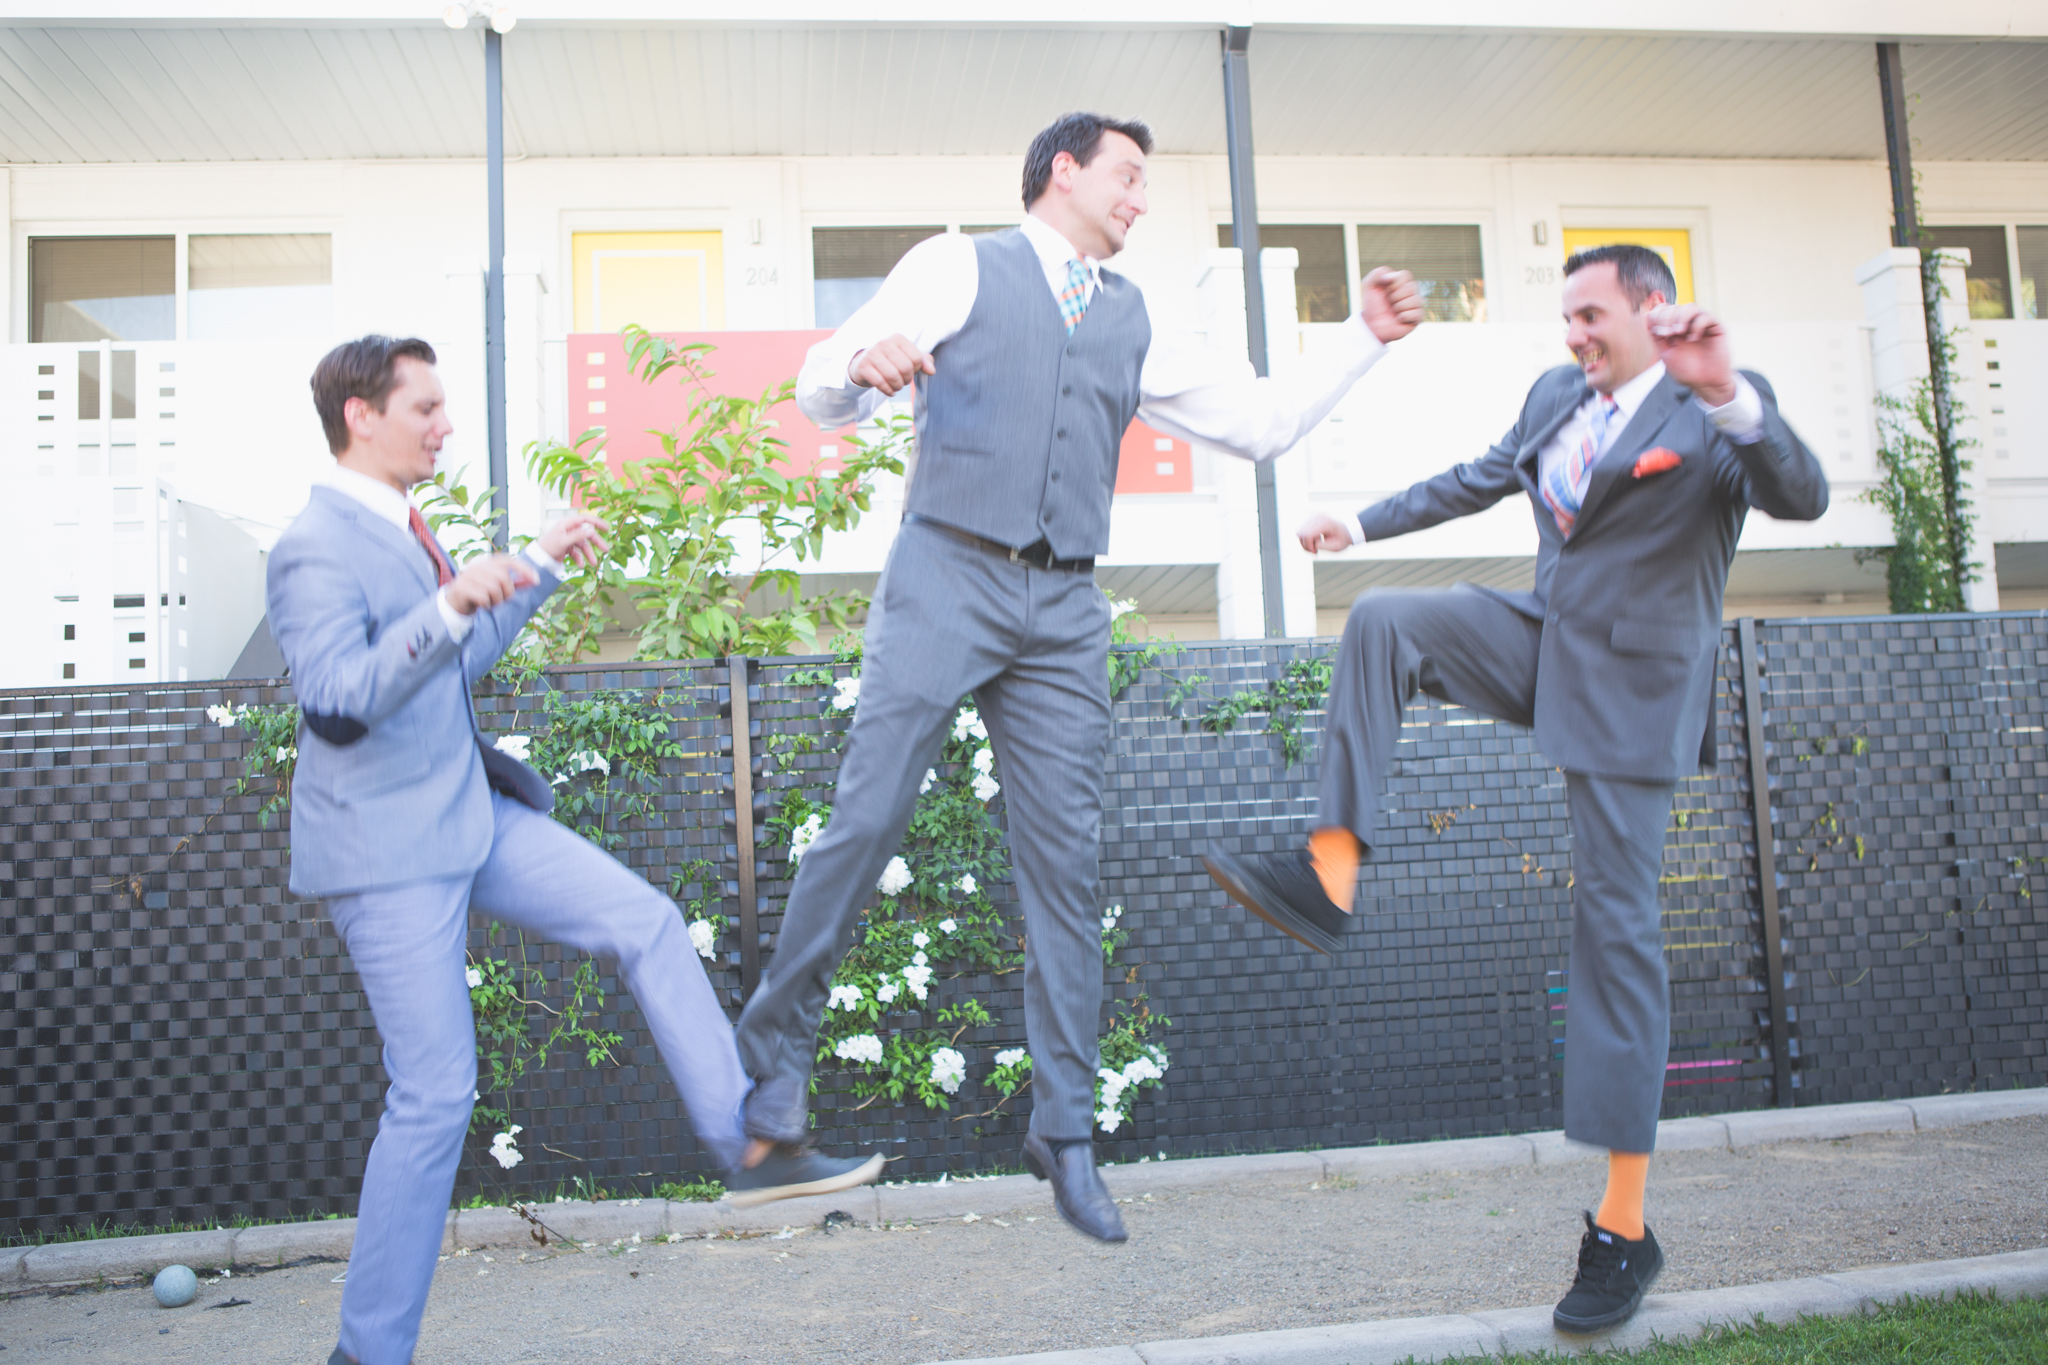 scottsdale-wedding-photographer-el-dorado-groom-brothers-play-fighting